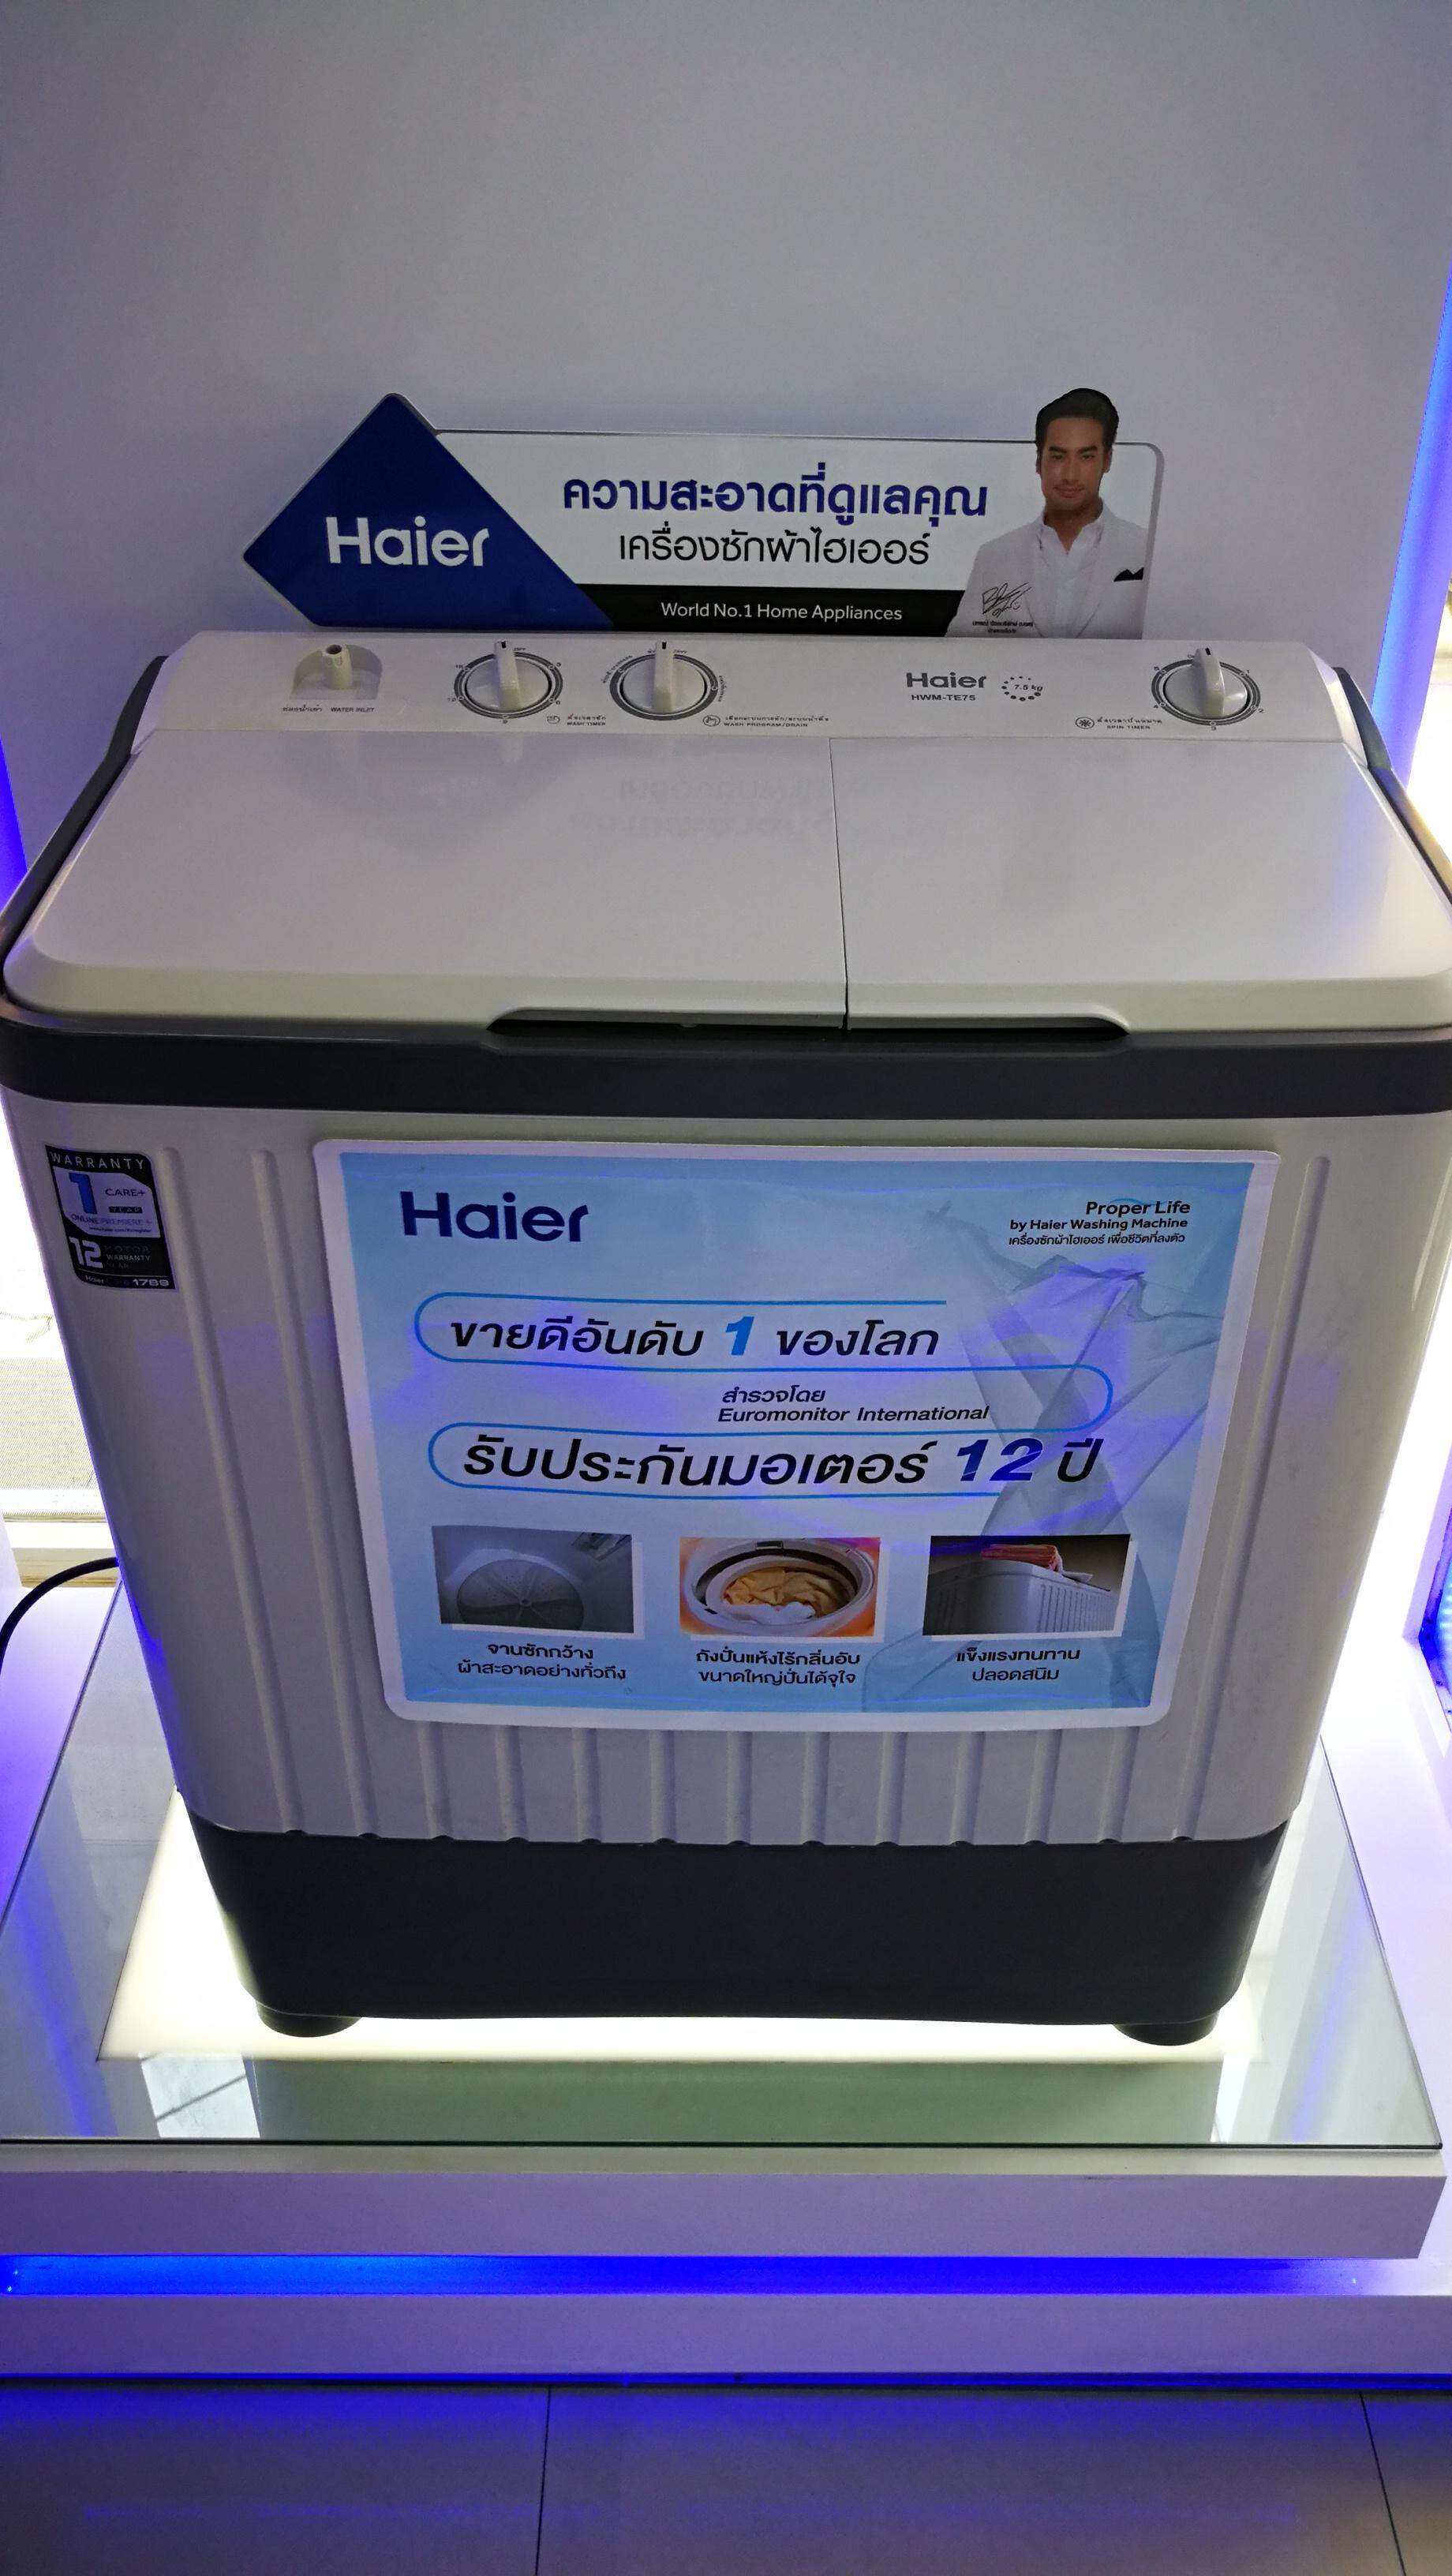 Haier เครื่องซักผ้า 2 ถัง 7.5 กก. รุ่น Hwm-Te75  สีเทา (ตัวถังเรซิ่นปลอดสนิม Life Time) รับประกันมอเตอร์ 12ปี.